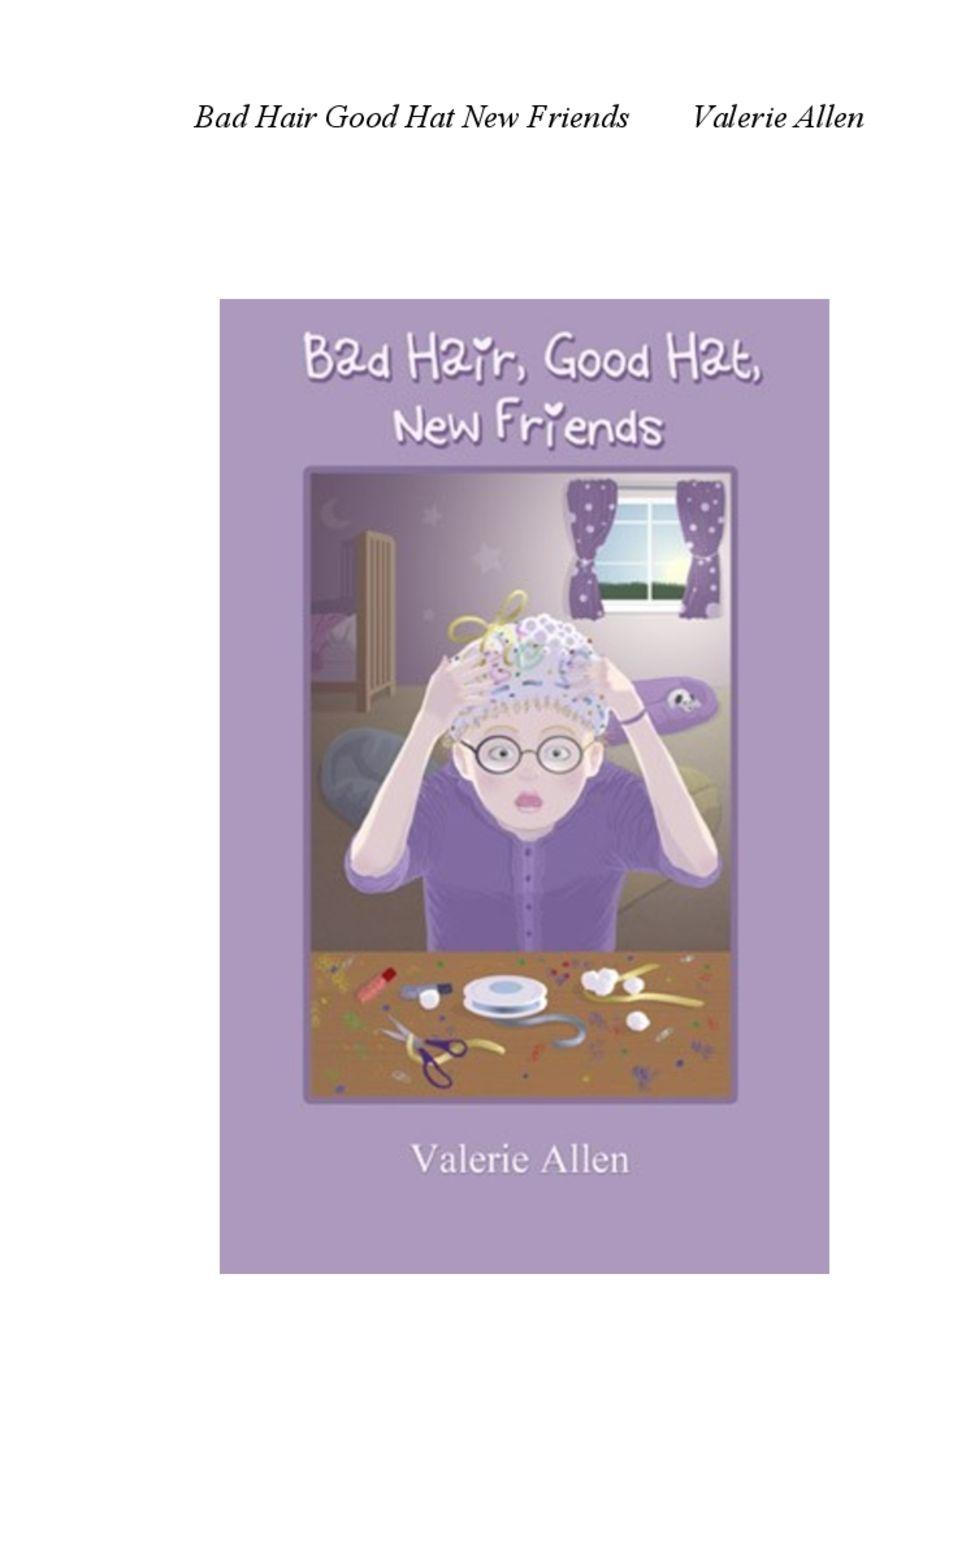 Reading Bad Hair, Good Hat, New Friends by Valerie Allen